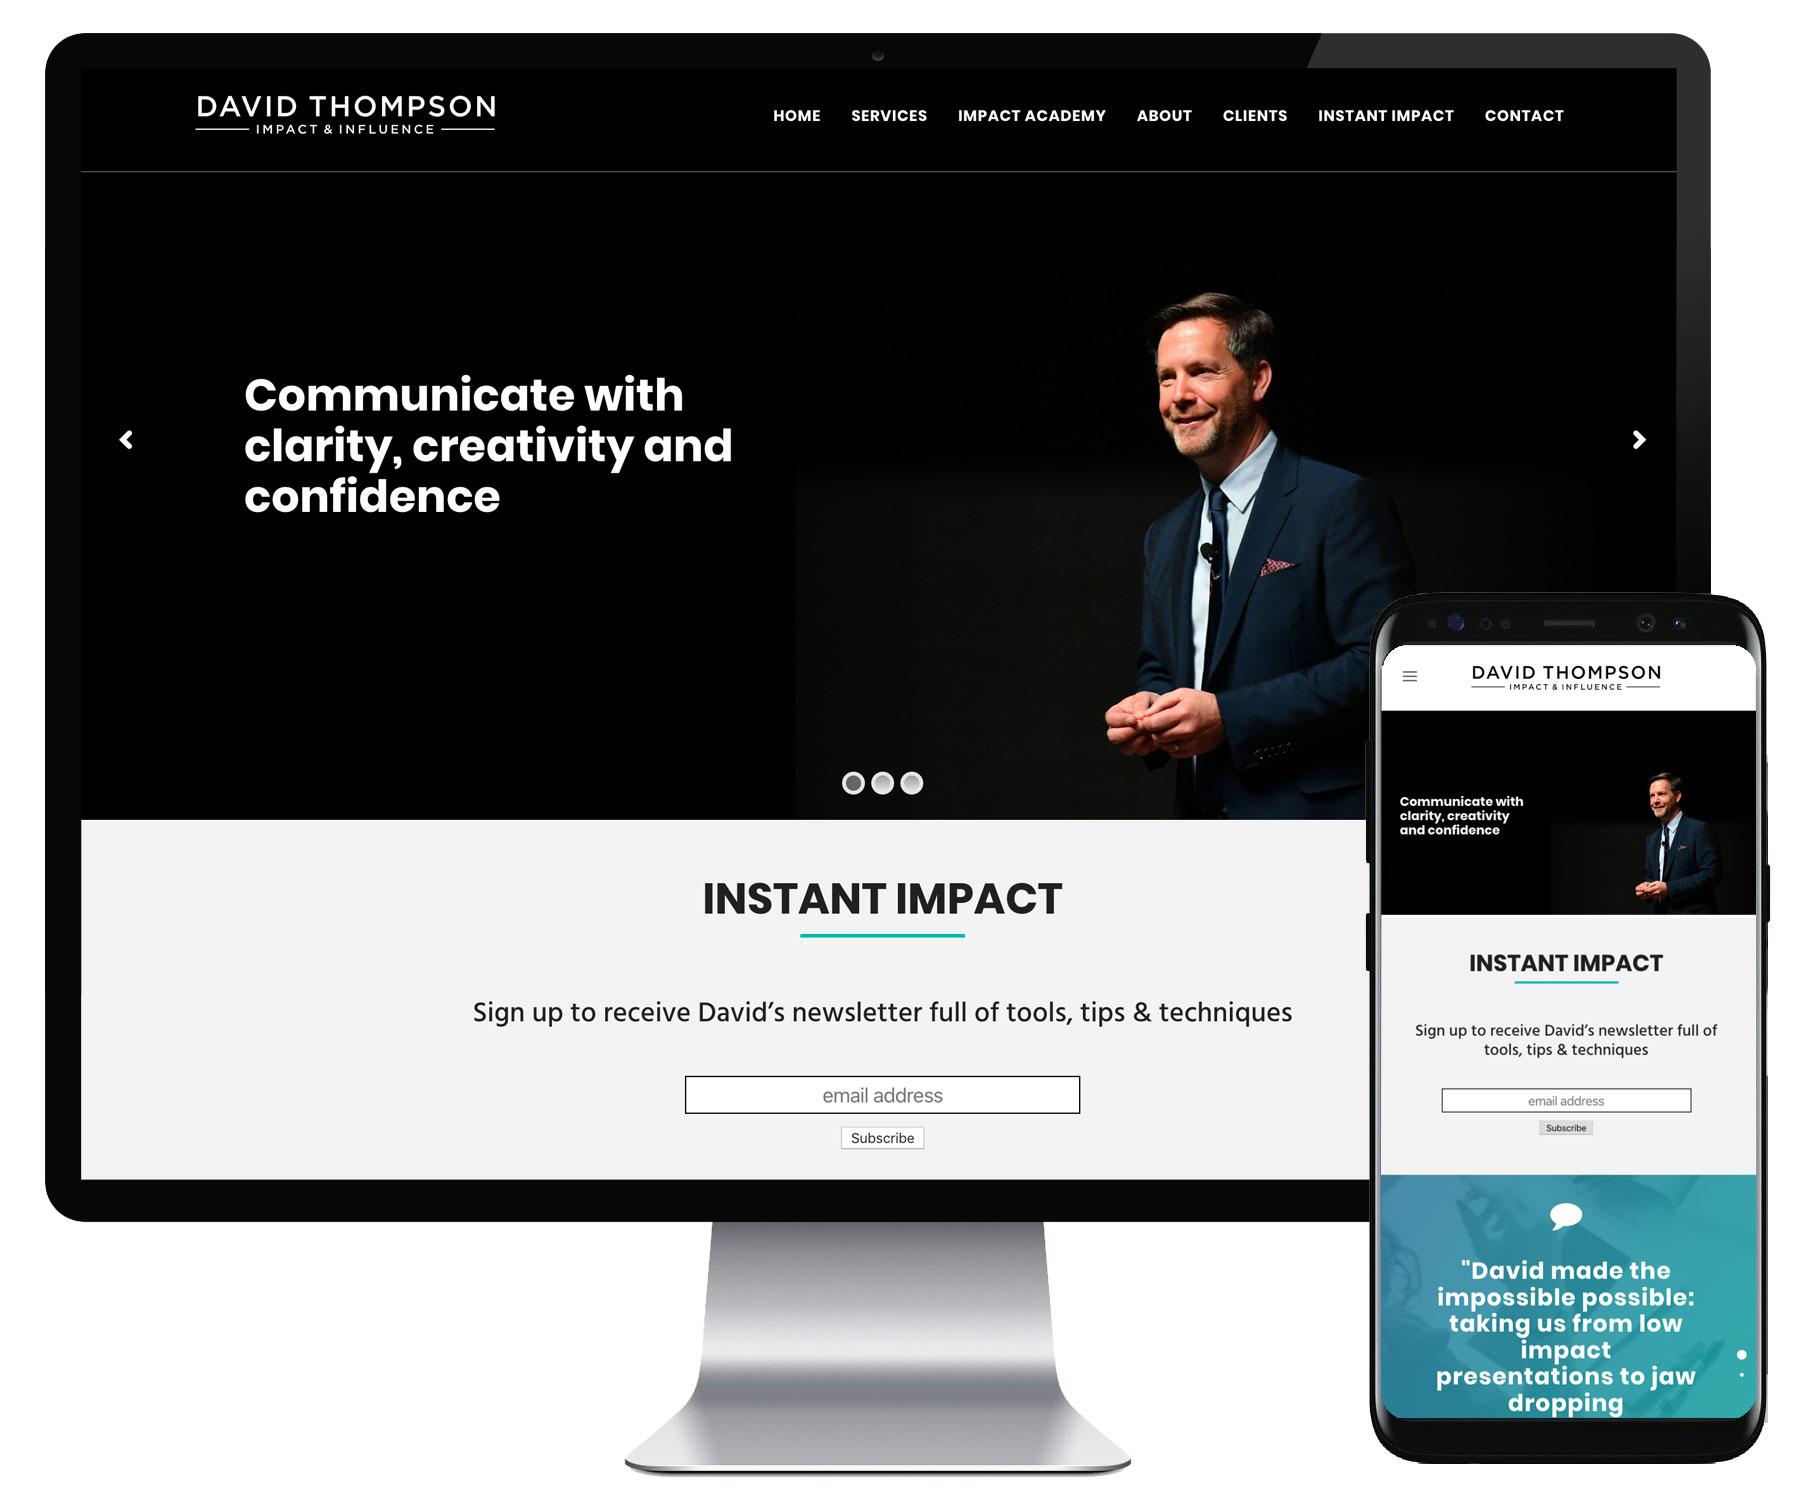 David Thompson website